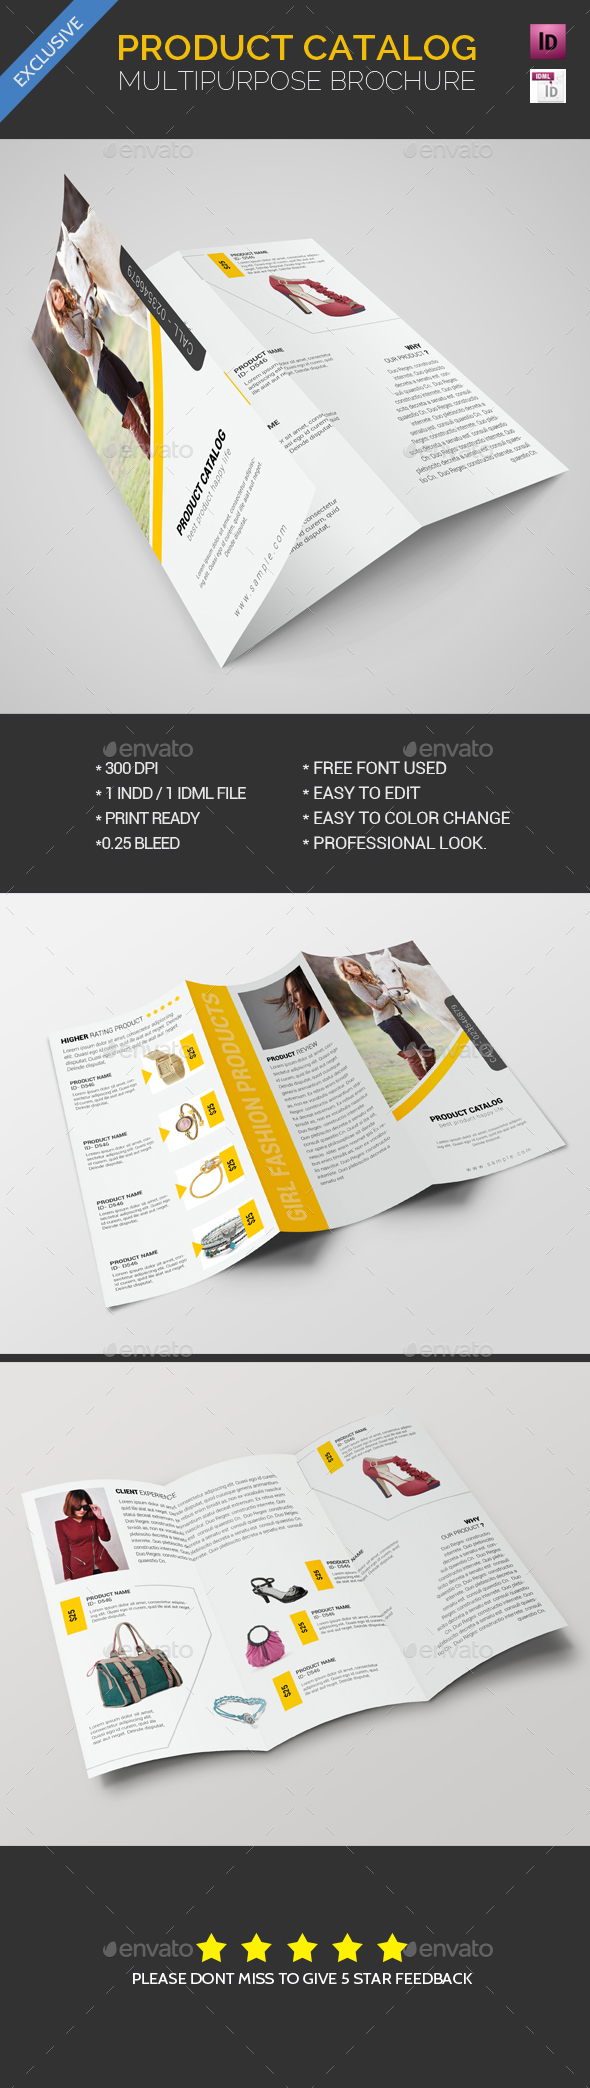 Product Catalog Trifold Brochure - Brochures Print Templates